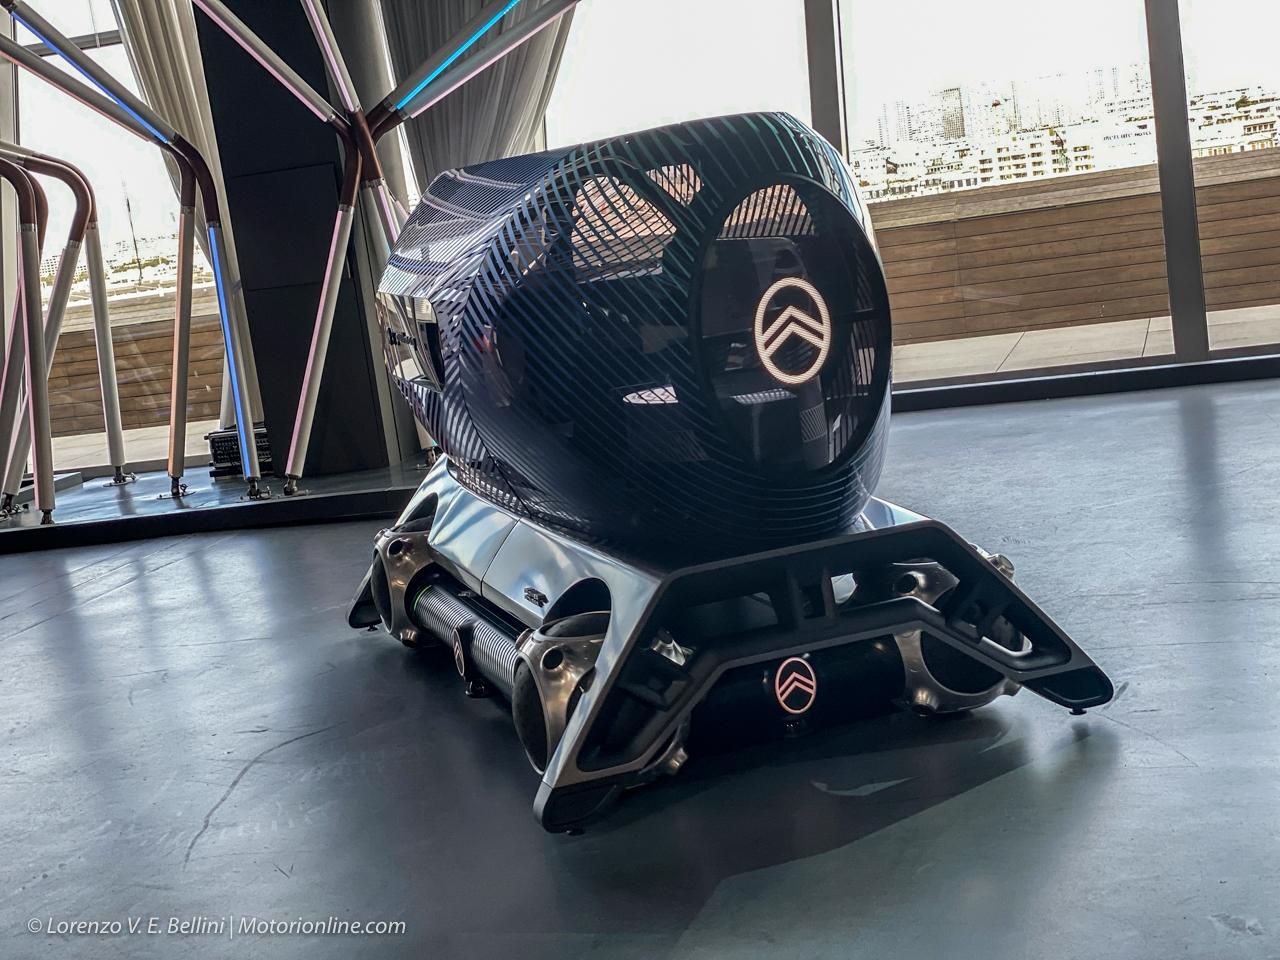 Citroen Urban Collectif - Skate e Pods Guida Autonoma